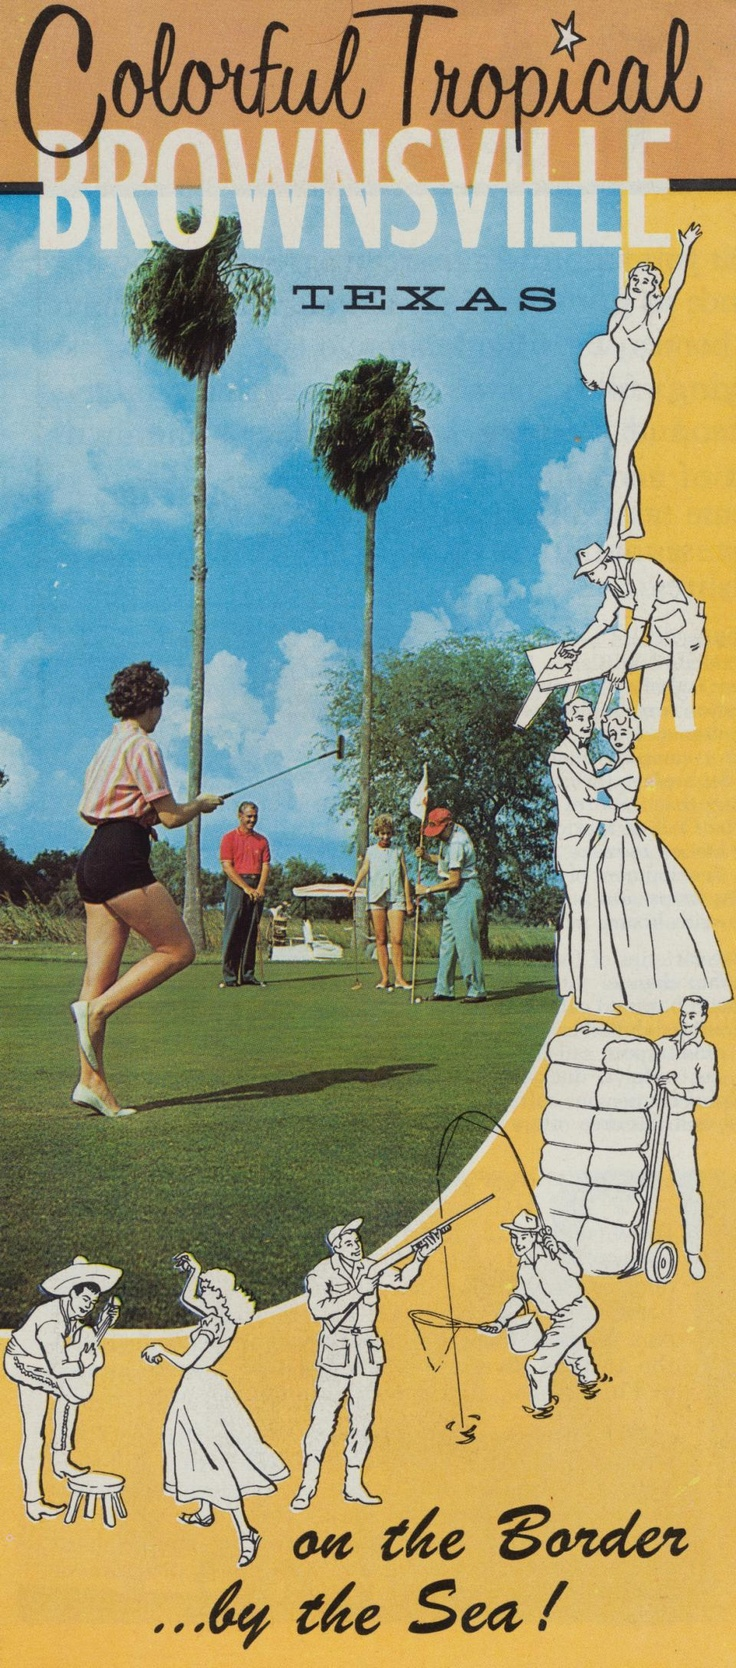 Vintage brochure for Texas tourism